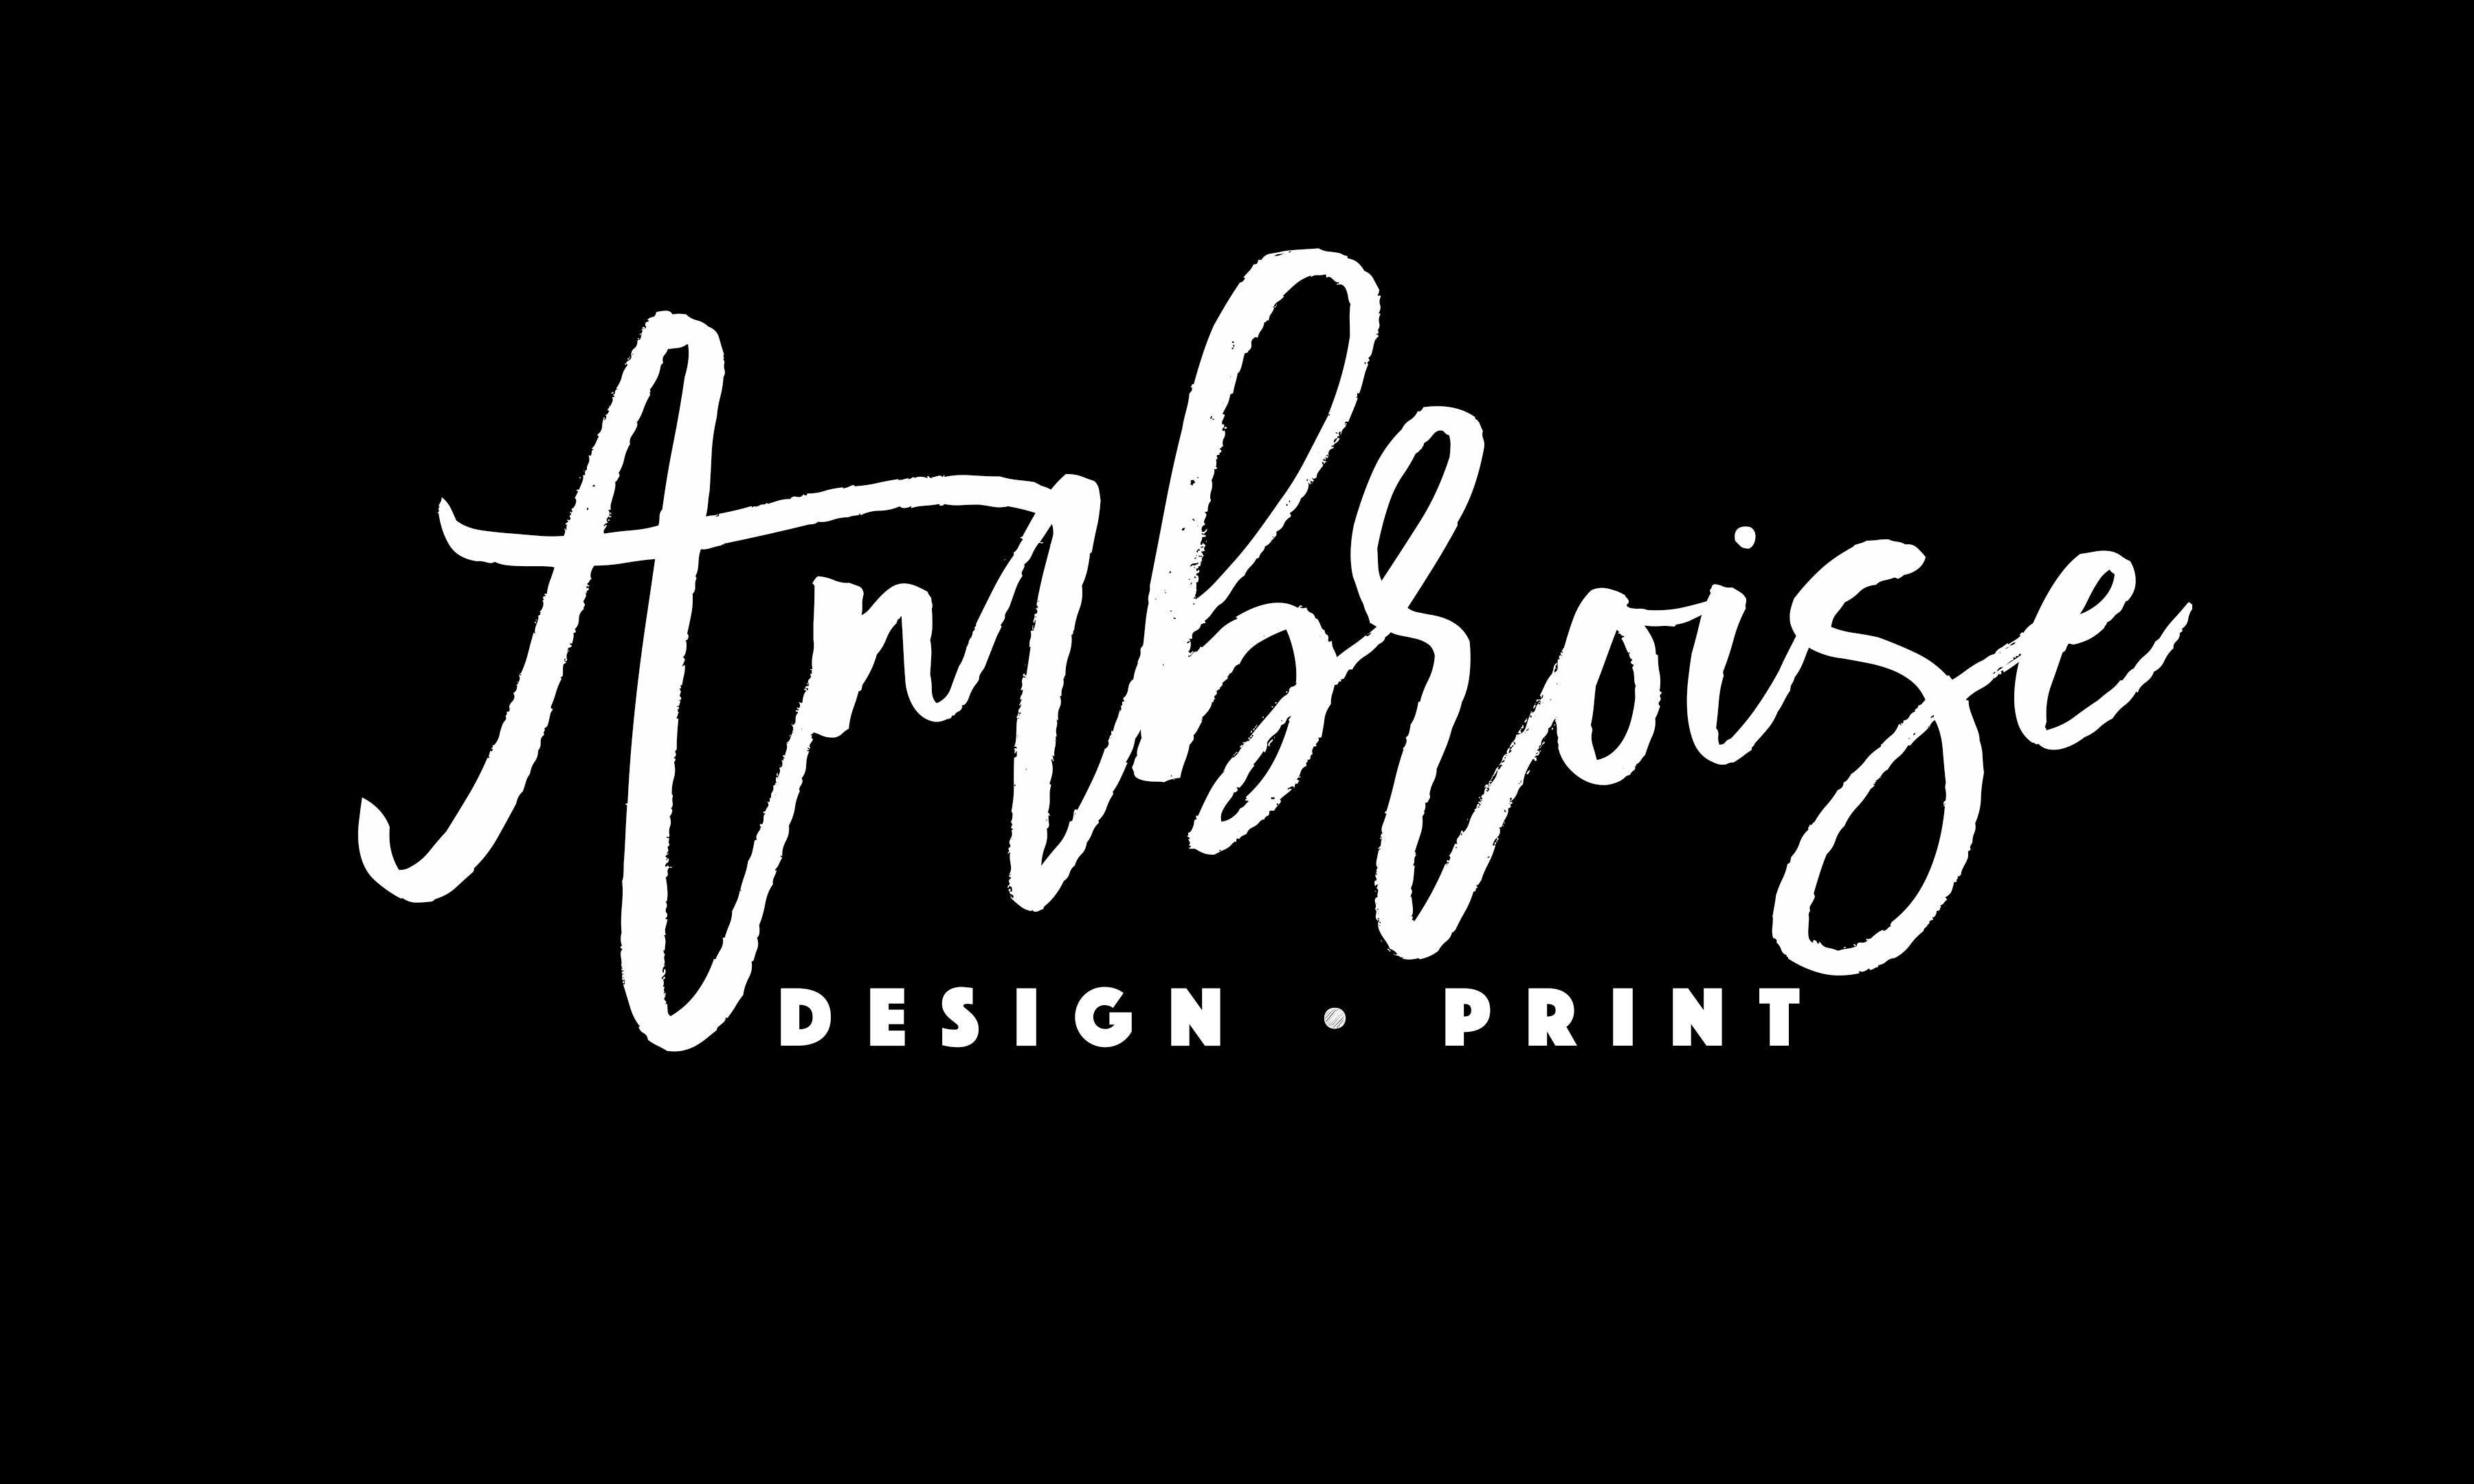 Ambroise Design & Print